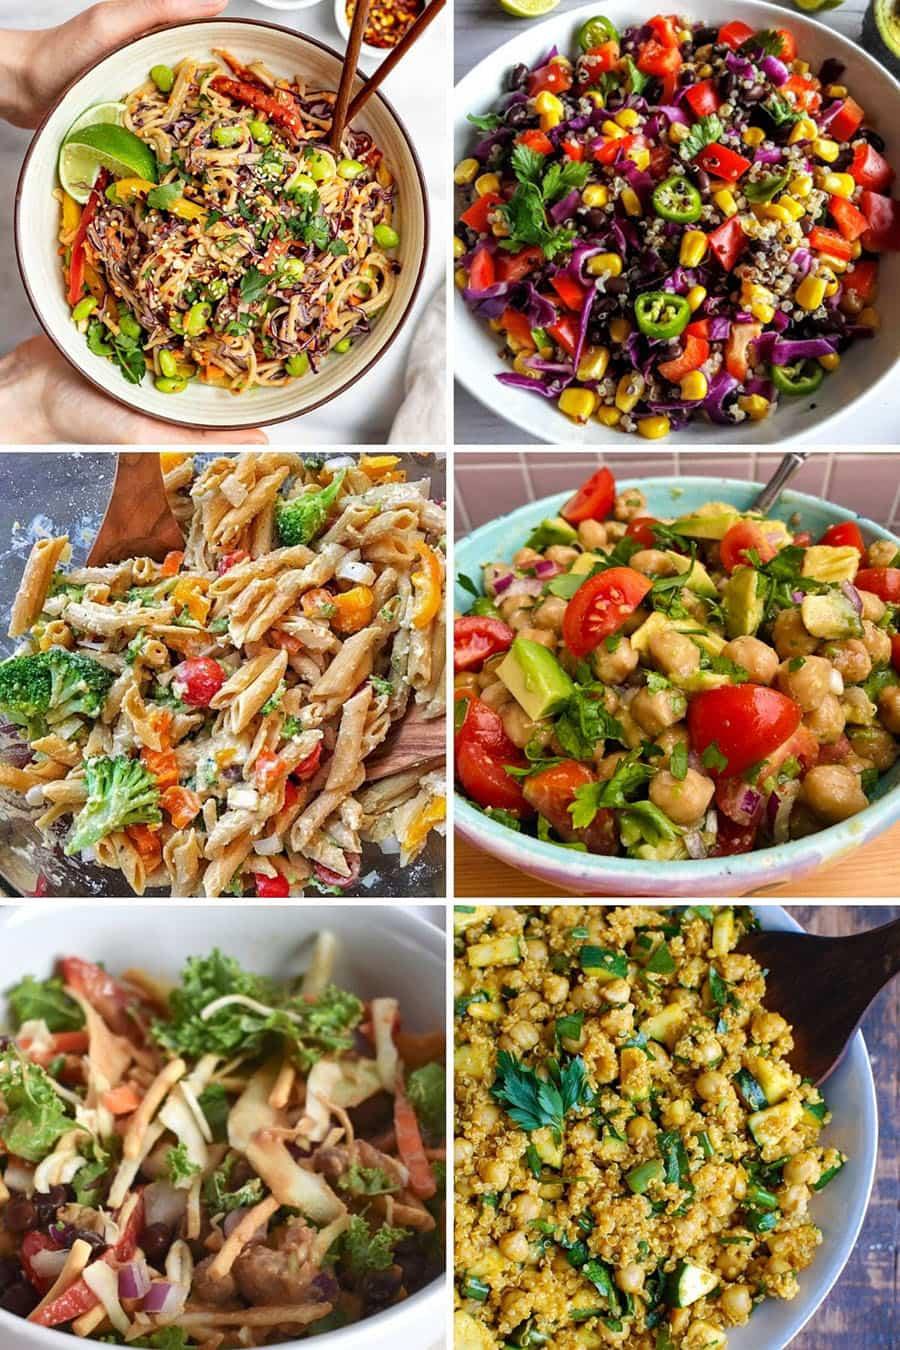 Collage of 6 vegan salad recipes: pasta, noodle, quinoa, chickpea, avocado, zucchini and more